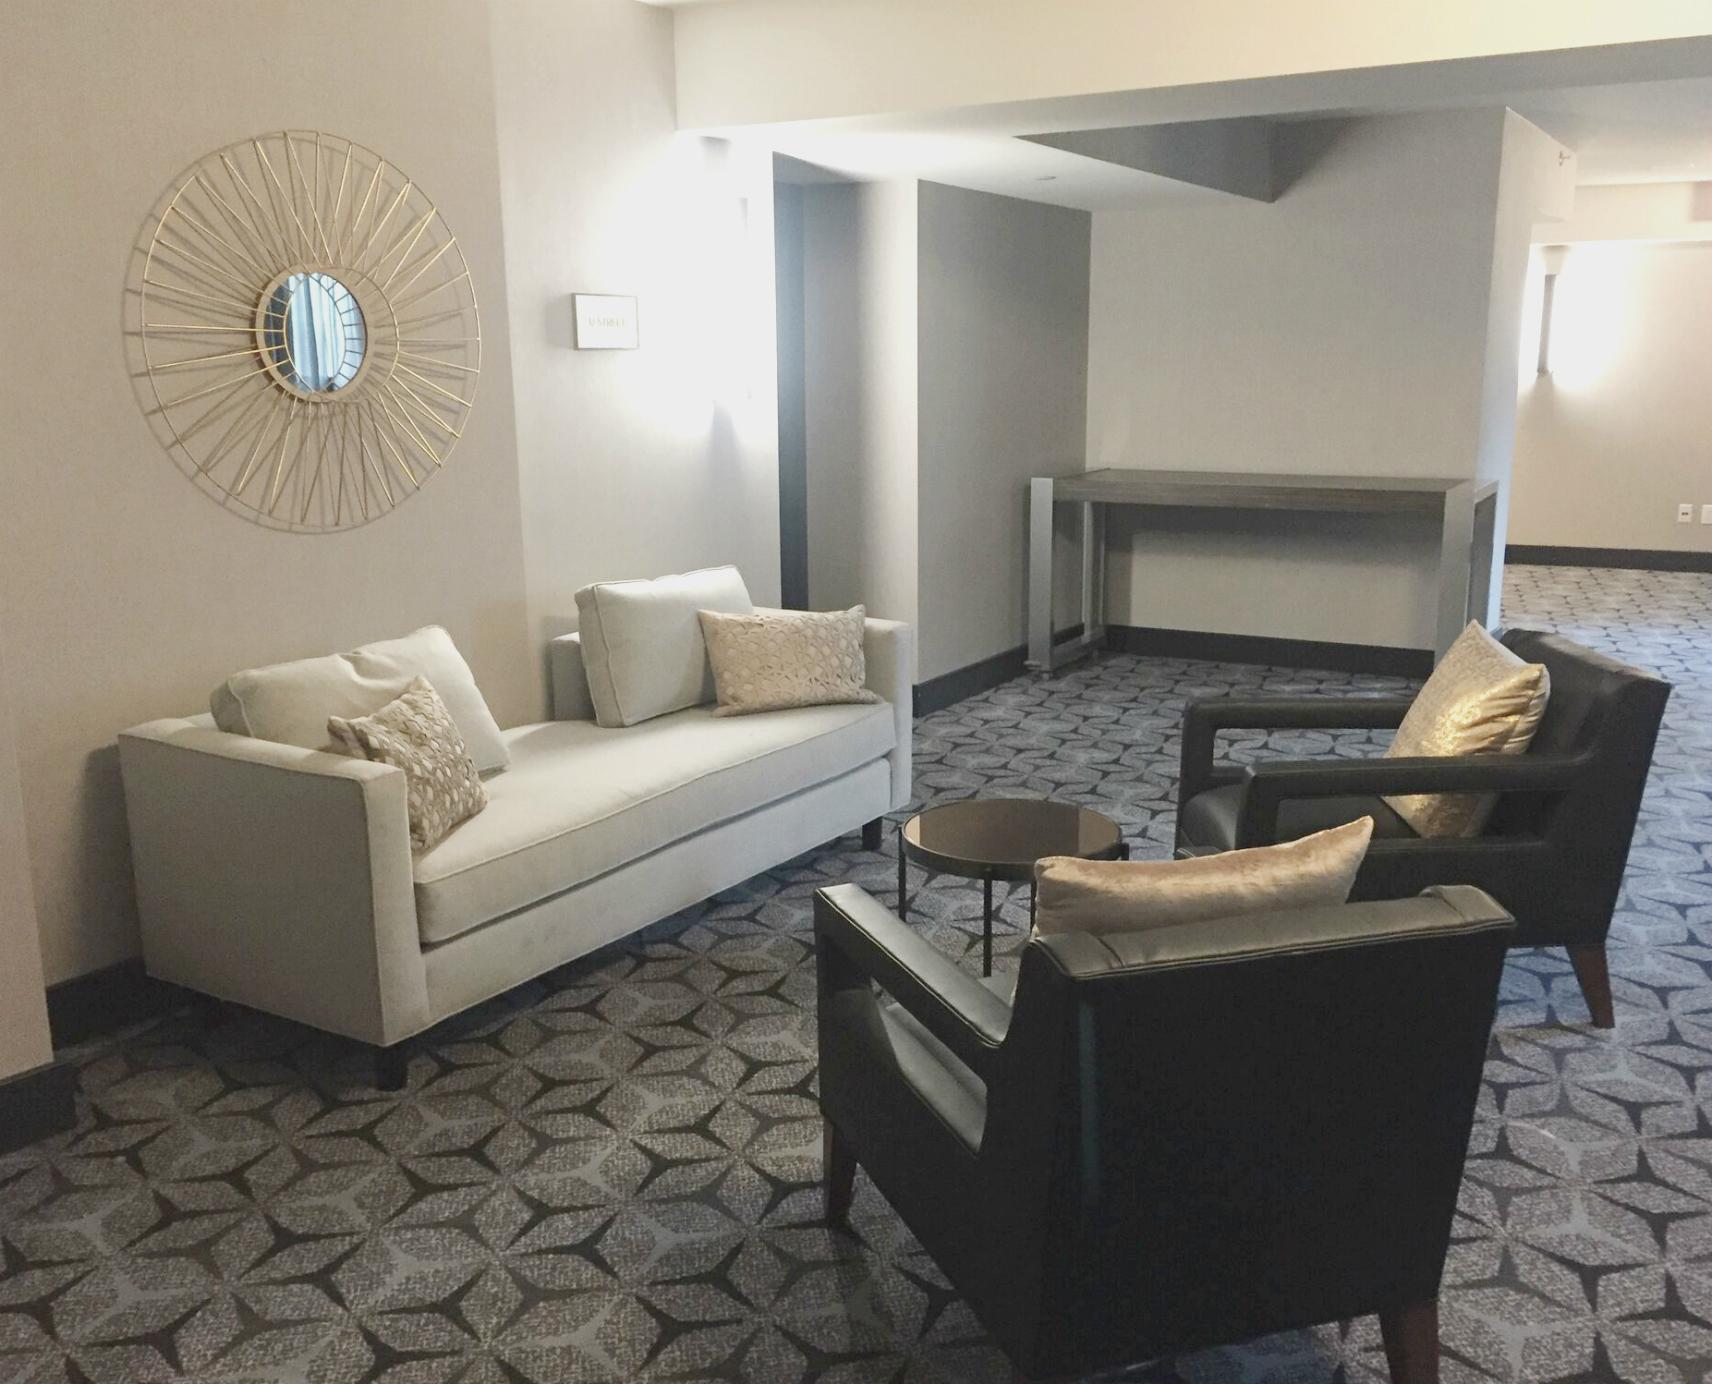 Corridor seating in The Washington Hilton